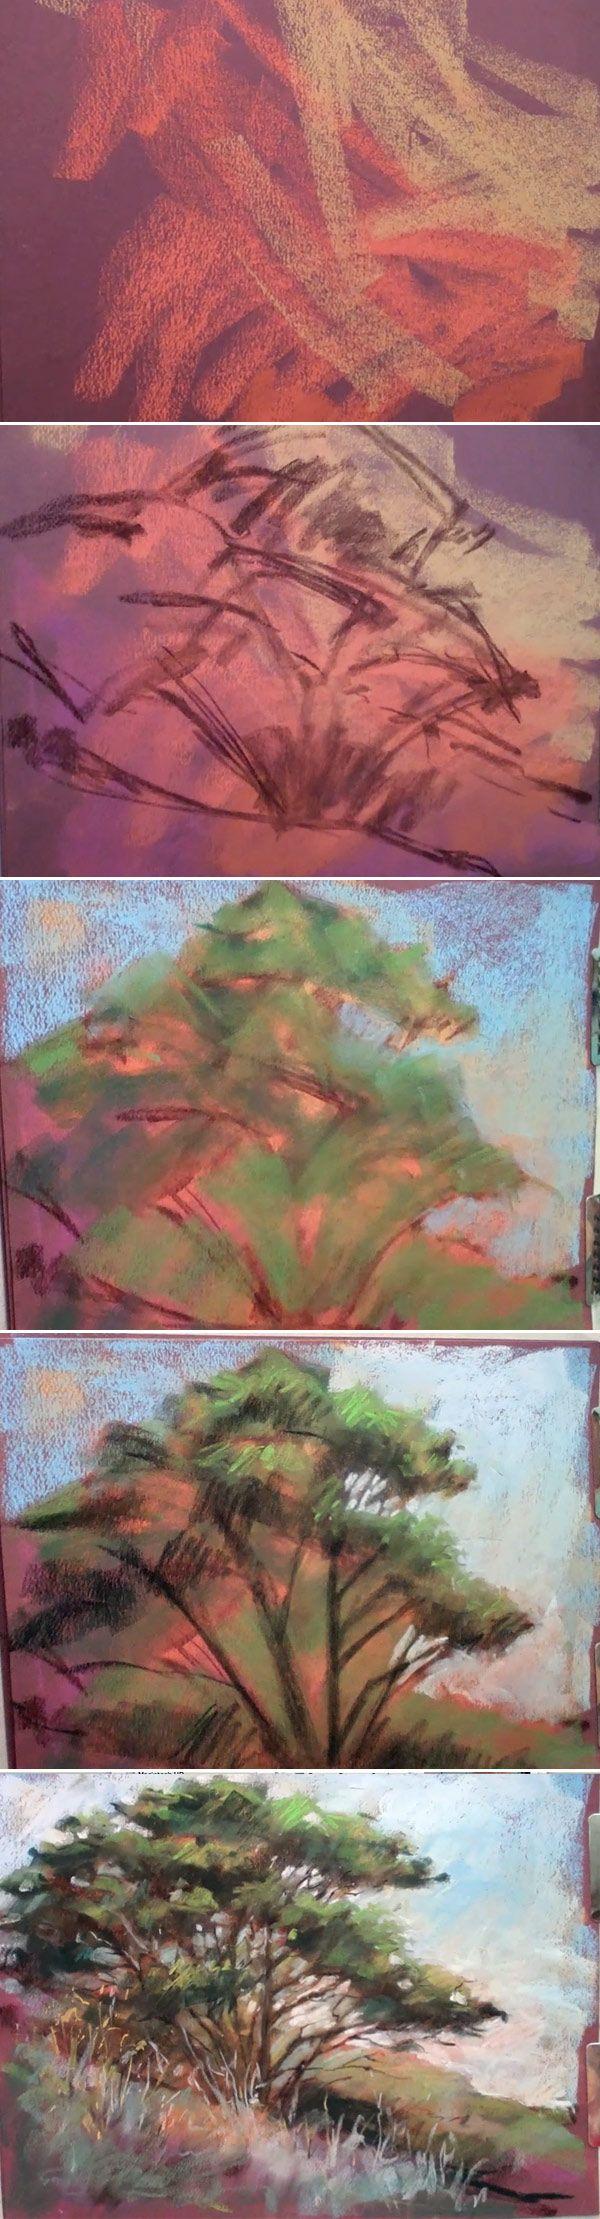 Pastel demo with Art League instructor Nancy Freeman — a quick sketch. Watch the video: http://www.youtube.com/watch?v=XYWMkGonzdw